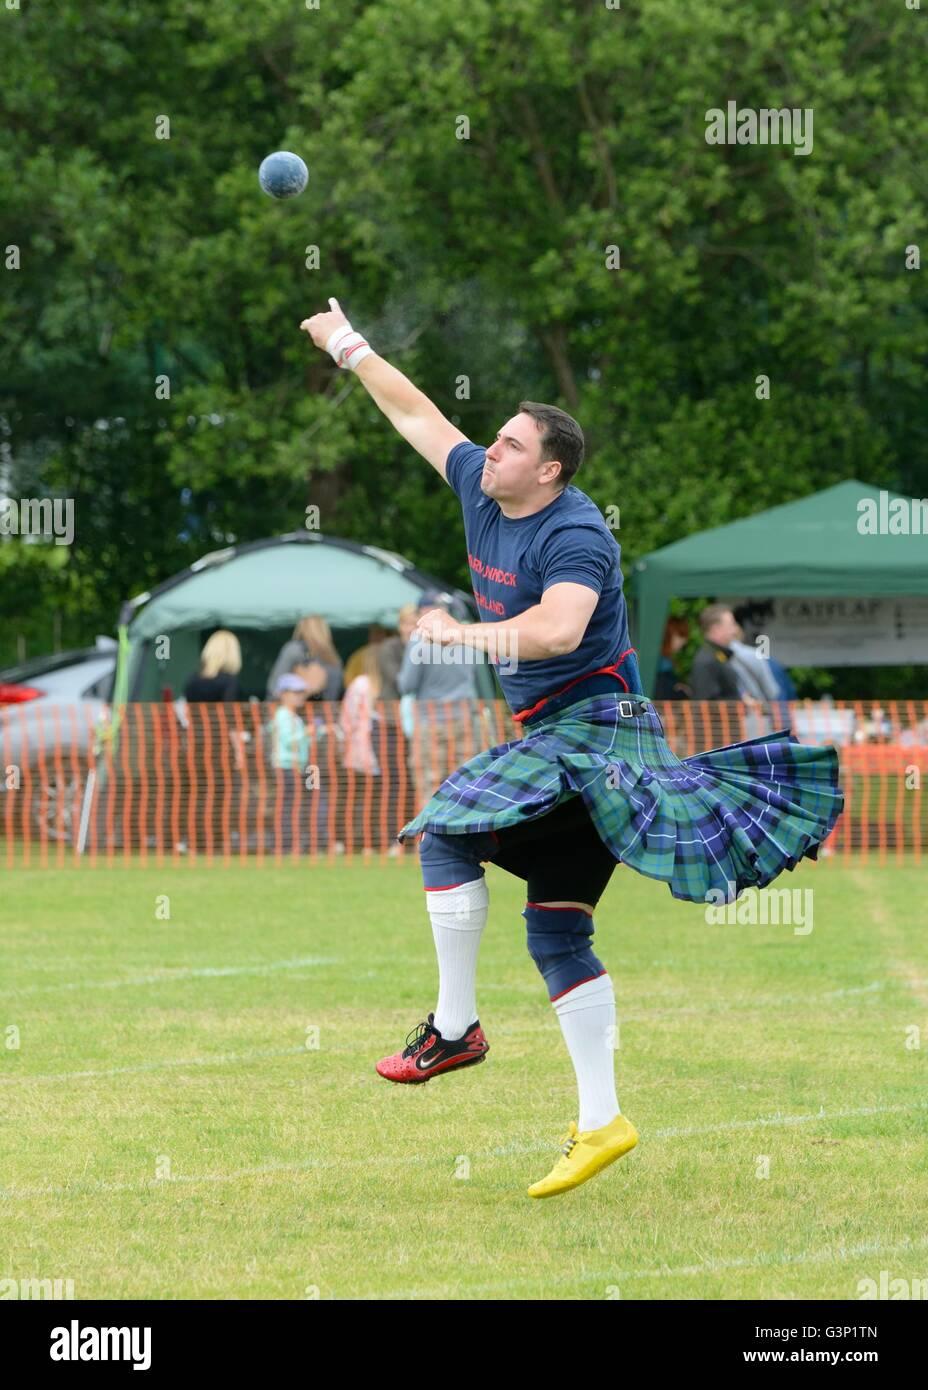 Mann im Kilt Schuss setzen bei Highland Games, Schottland, UK Stockbild